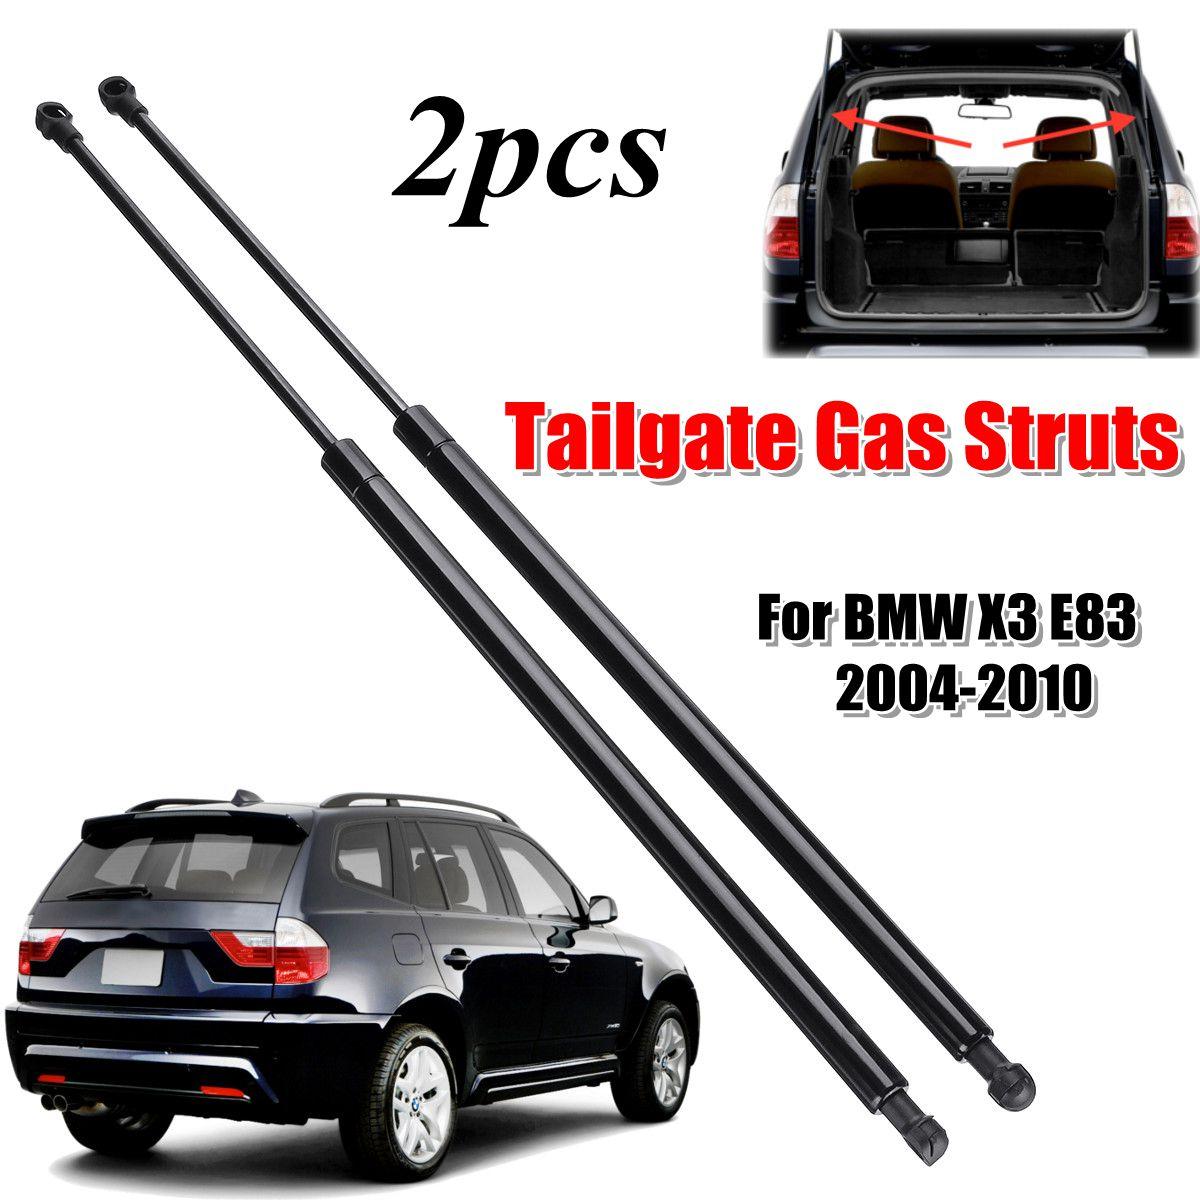 2Pcs ด้านหลัง Tailgate ฤดูใบไม้ผลิก๊าซแรงกระแทก Struts สนับสนุน Rod ARM บาร์ Bracket 51243400379 สำหรับ BMW E83 X3 2004 2005-2010